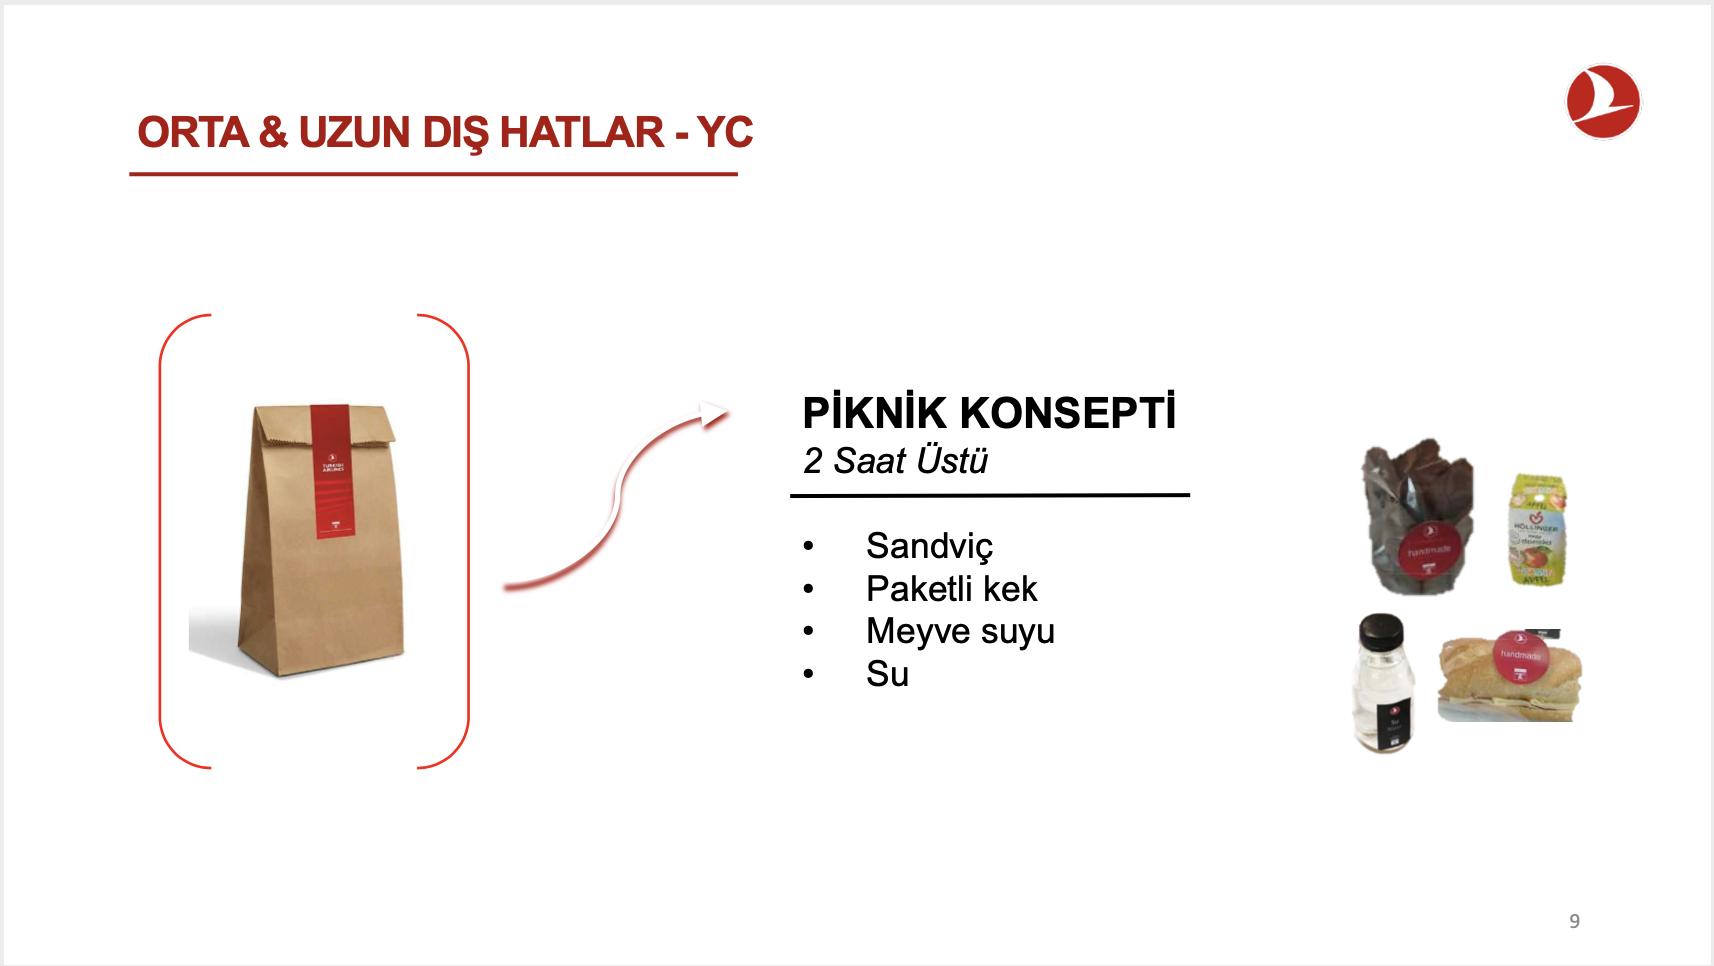 Turkish Airlines Economy Class Medium Haul Snack Bag